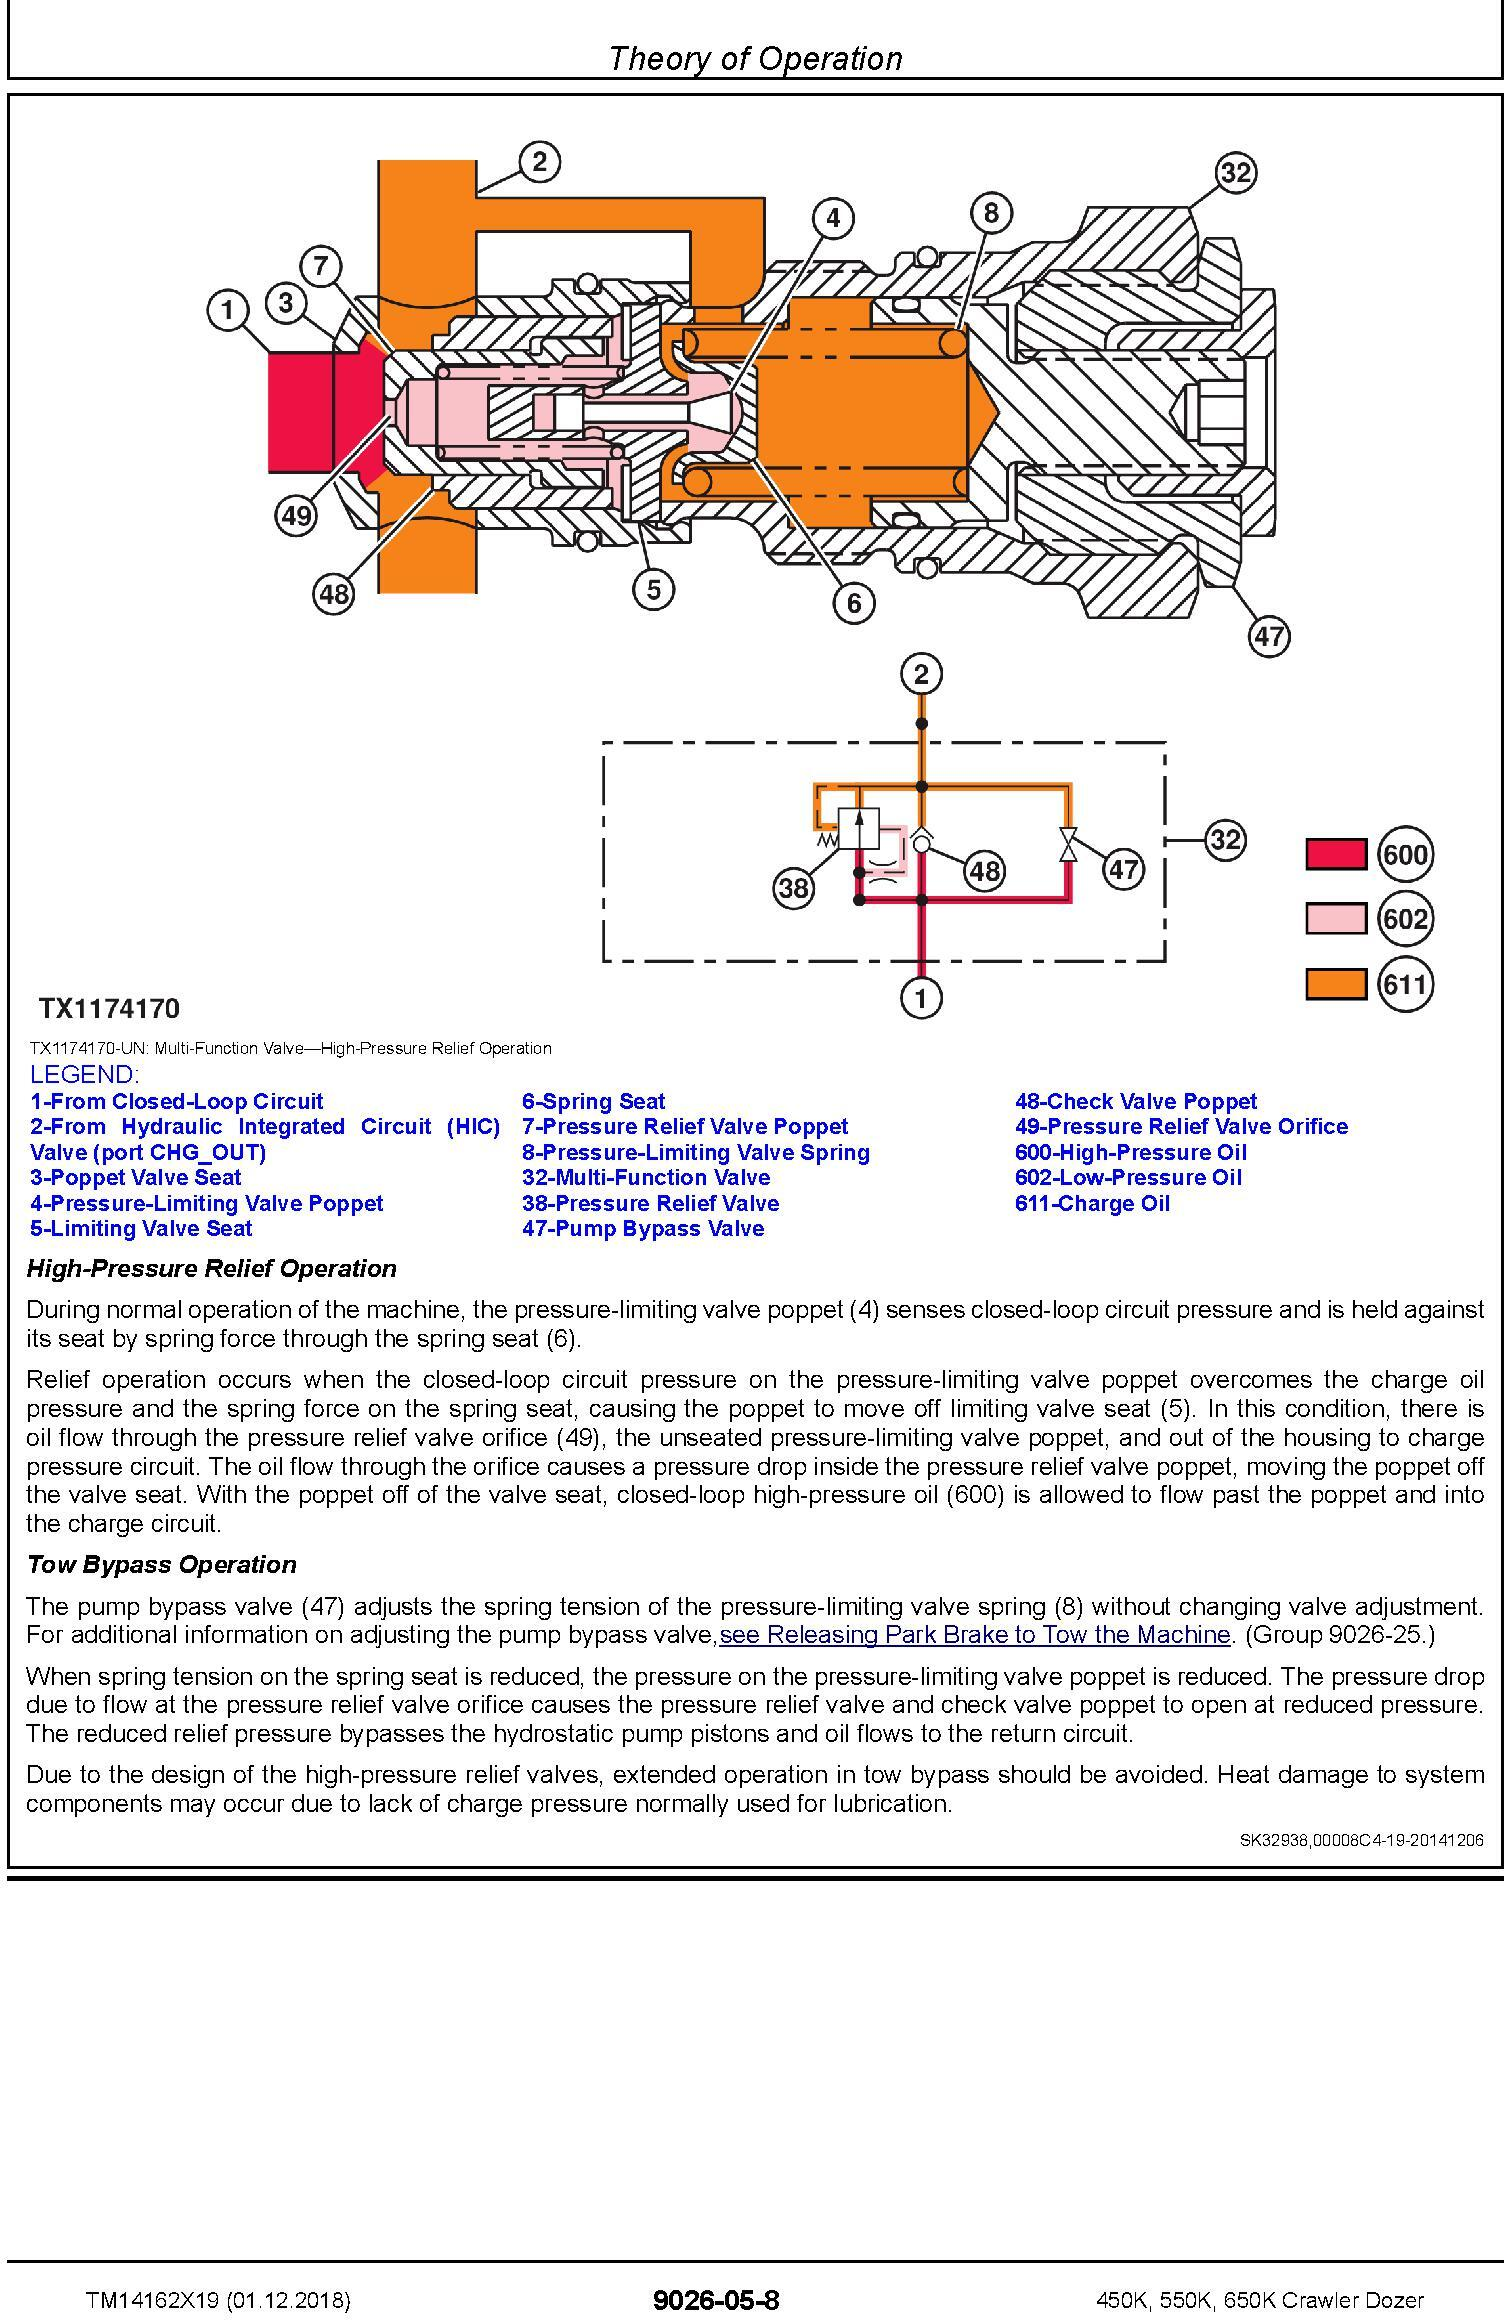 John Deere 450K, 550K, 650K (SN. F305399-) Crawler Dozer Diagnostic Technical Manual (TM14162X19) - 3